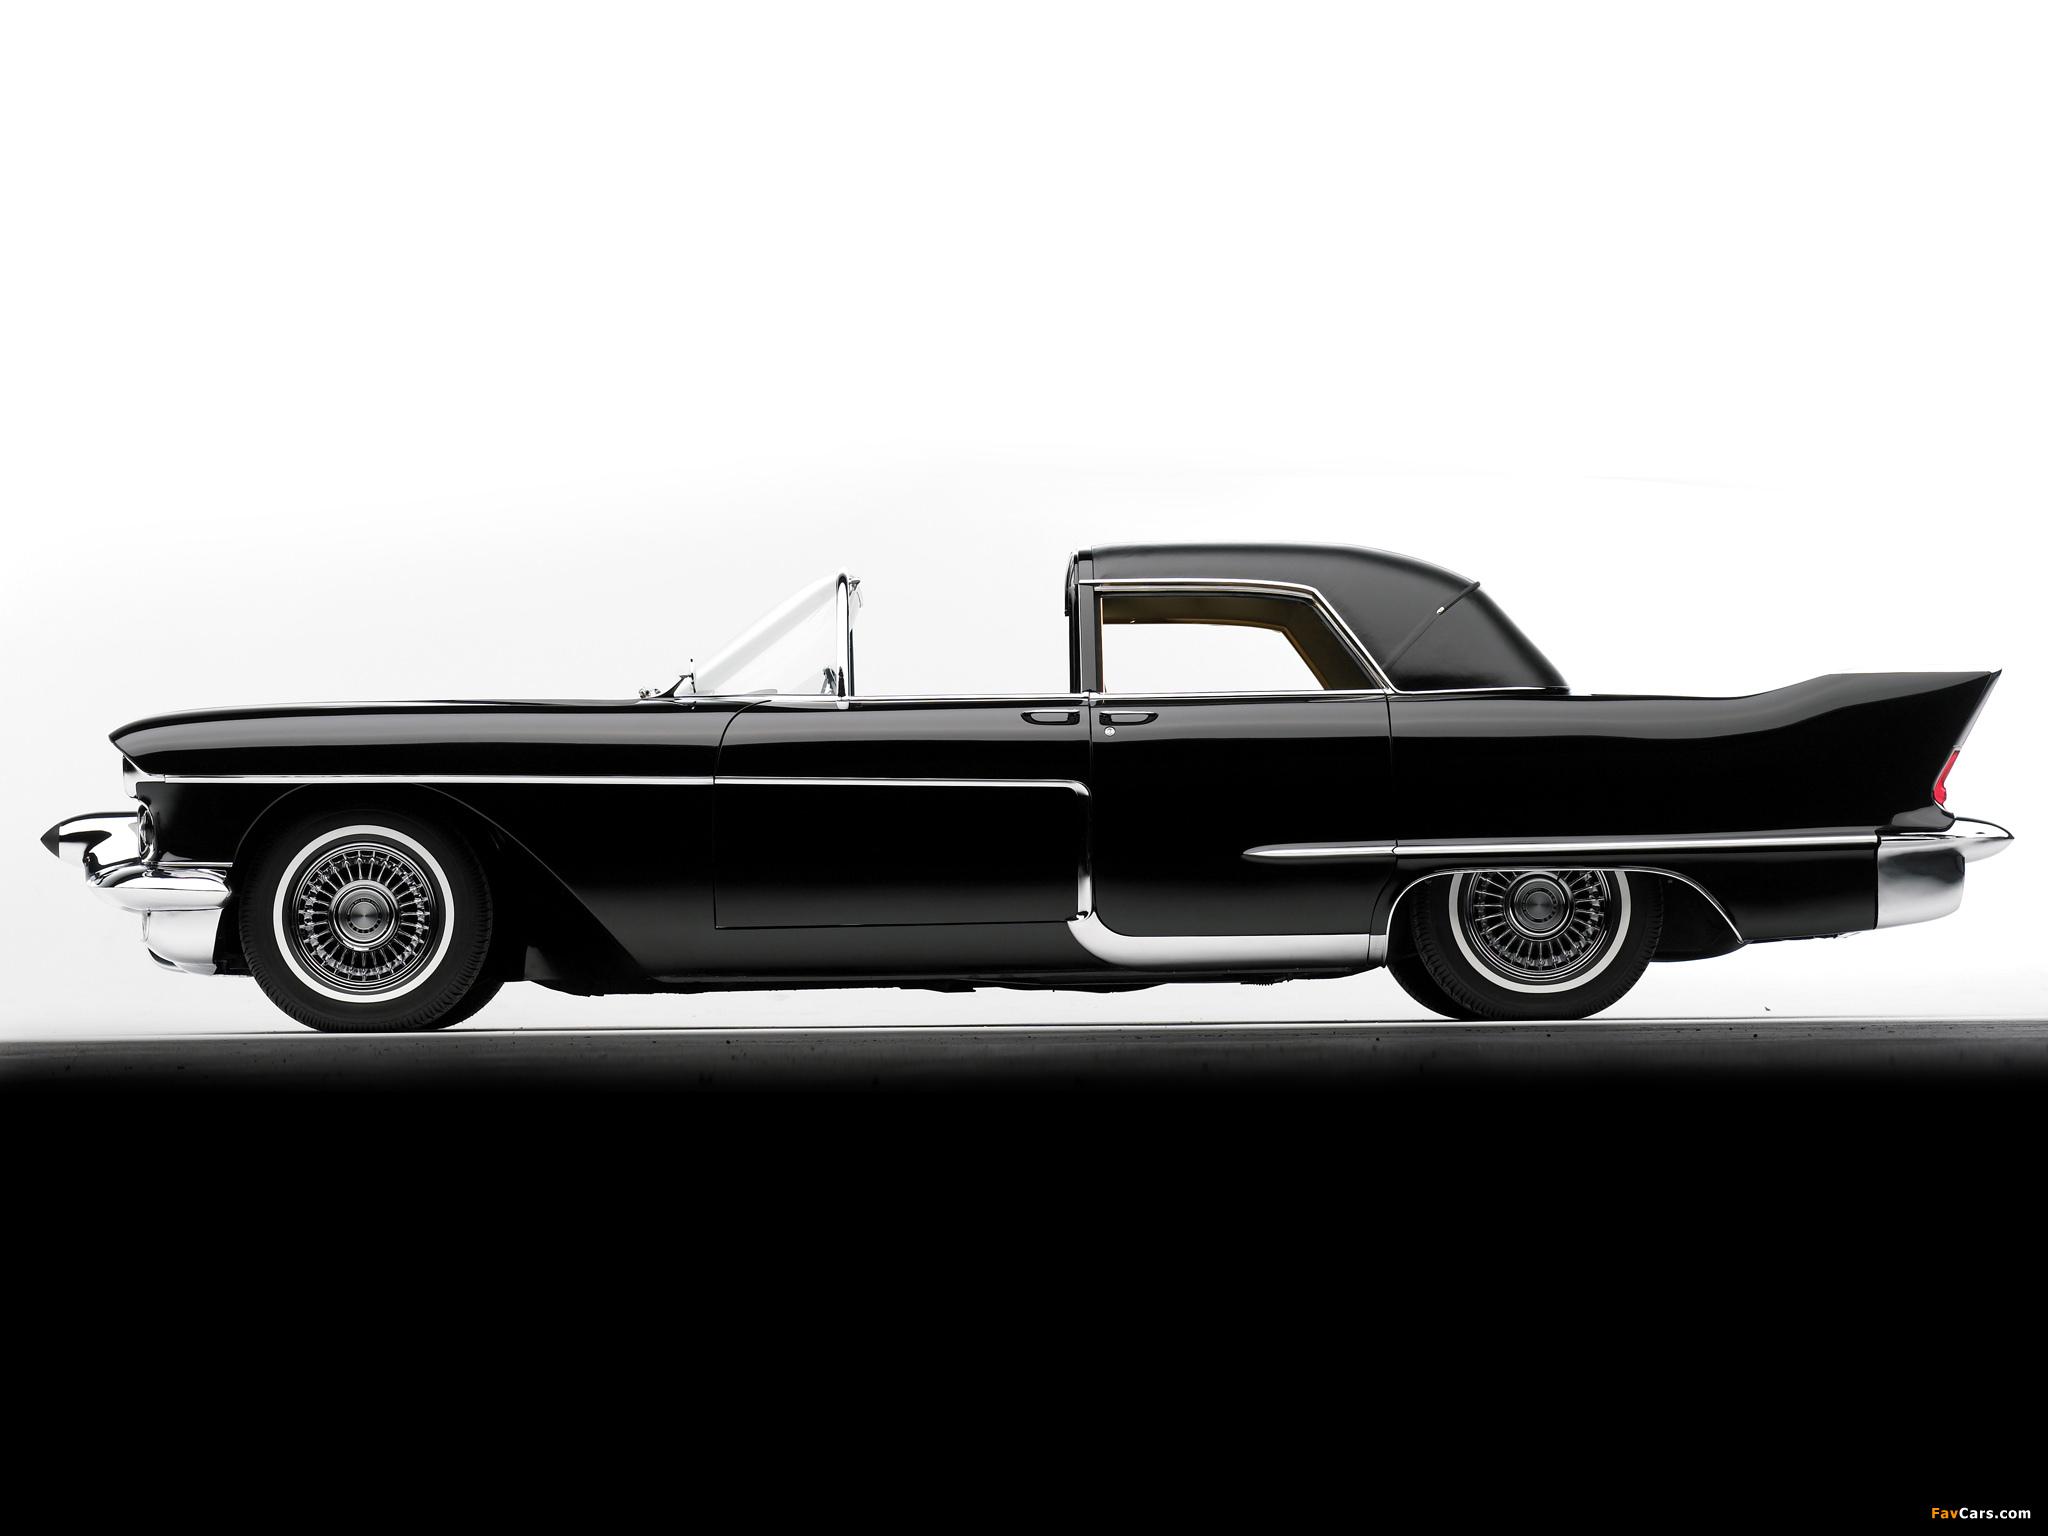 El Dorado Car >> Cadillac Eldorado Brougham Town Car Show Car 1956 photos (2048x1536)